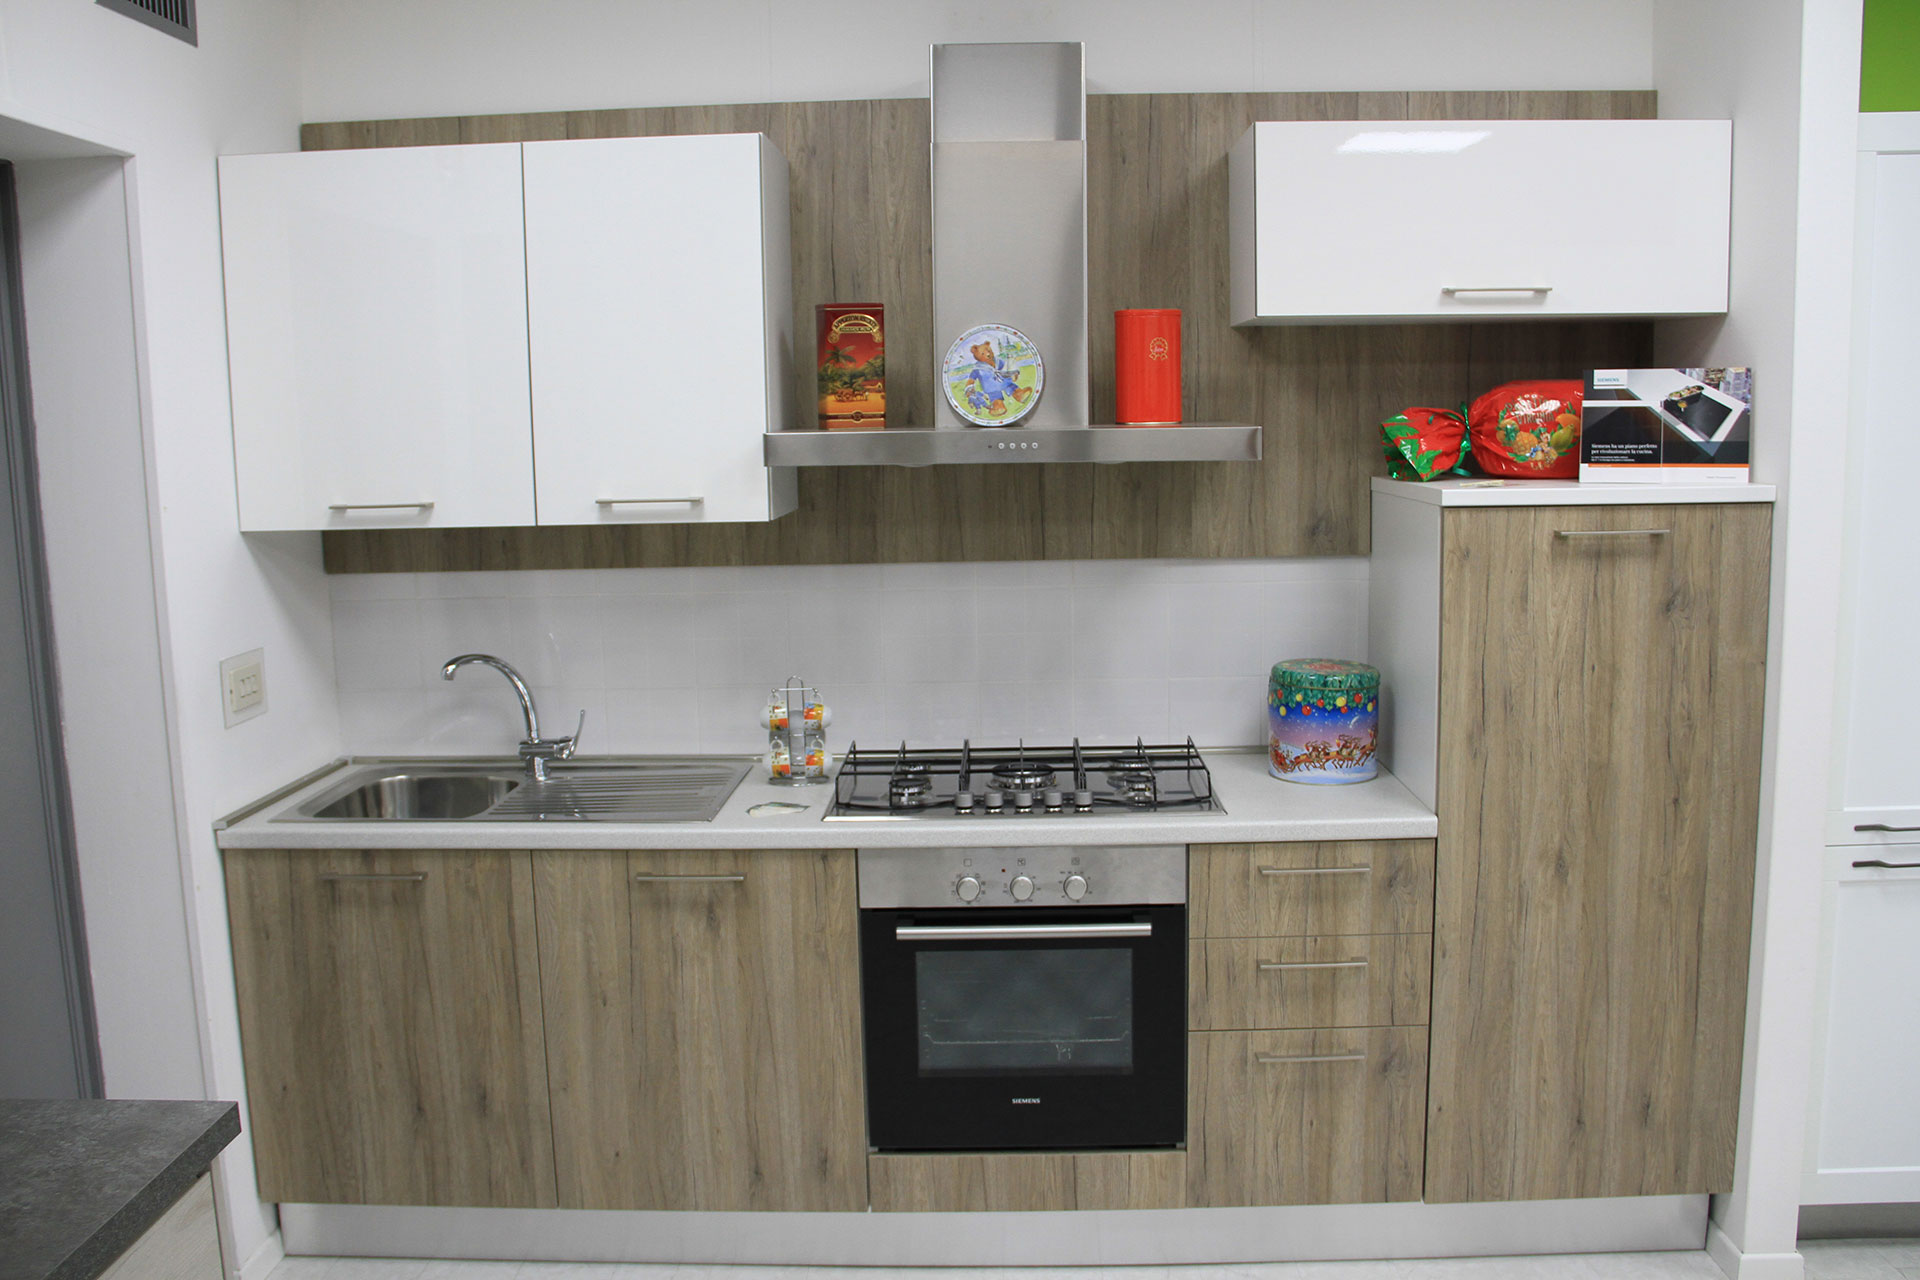 Stunning cucina in offerta photos - Cucina in offerta ...